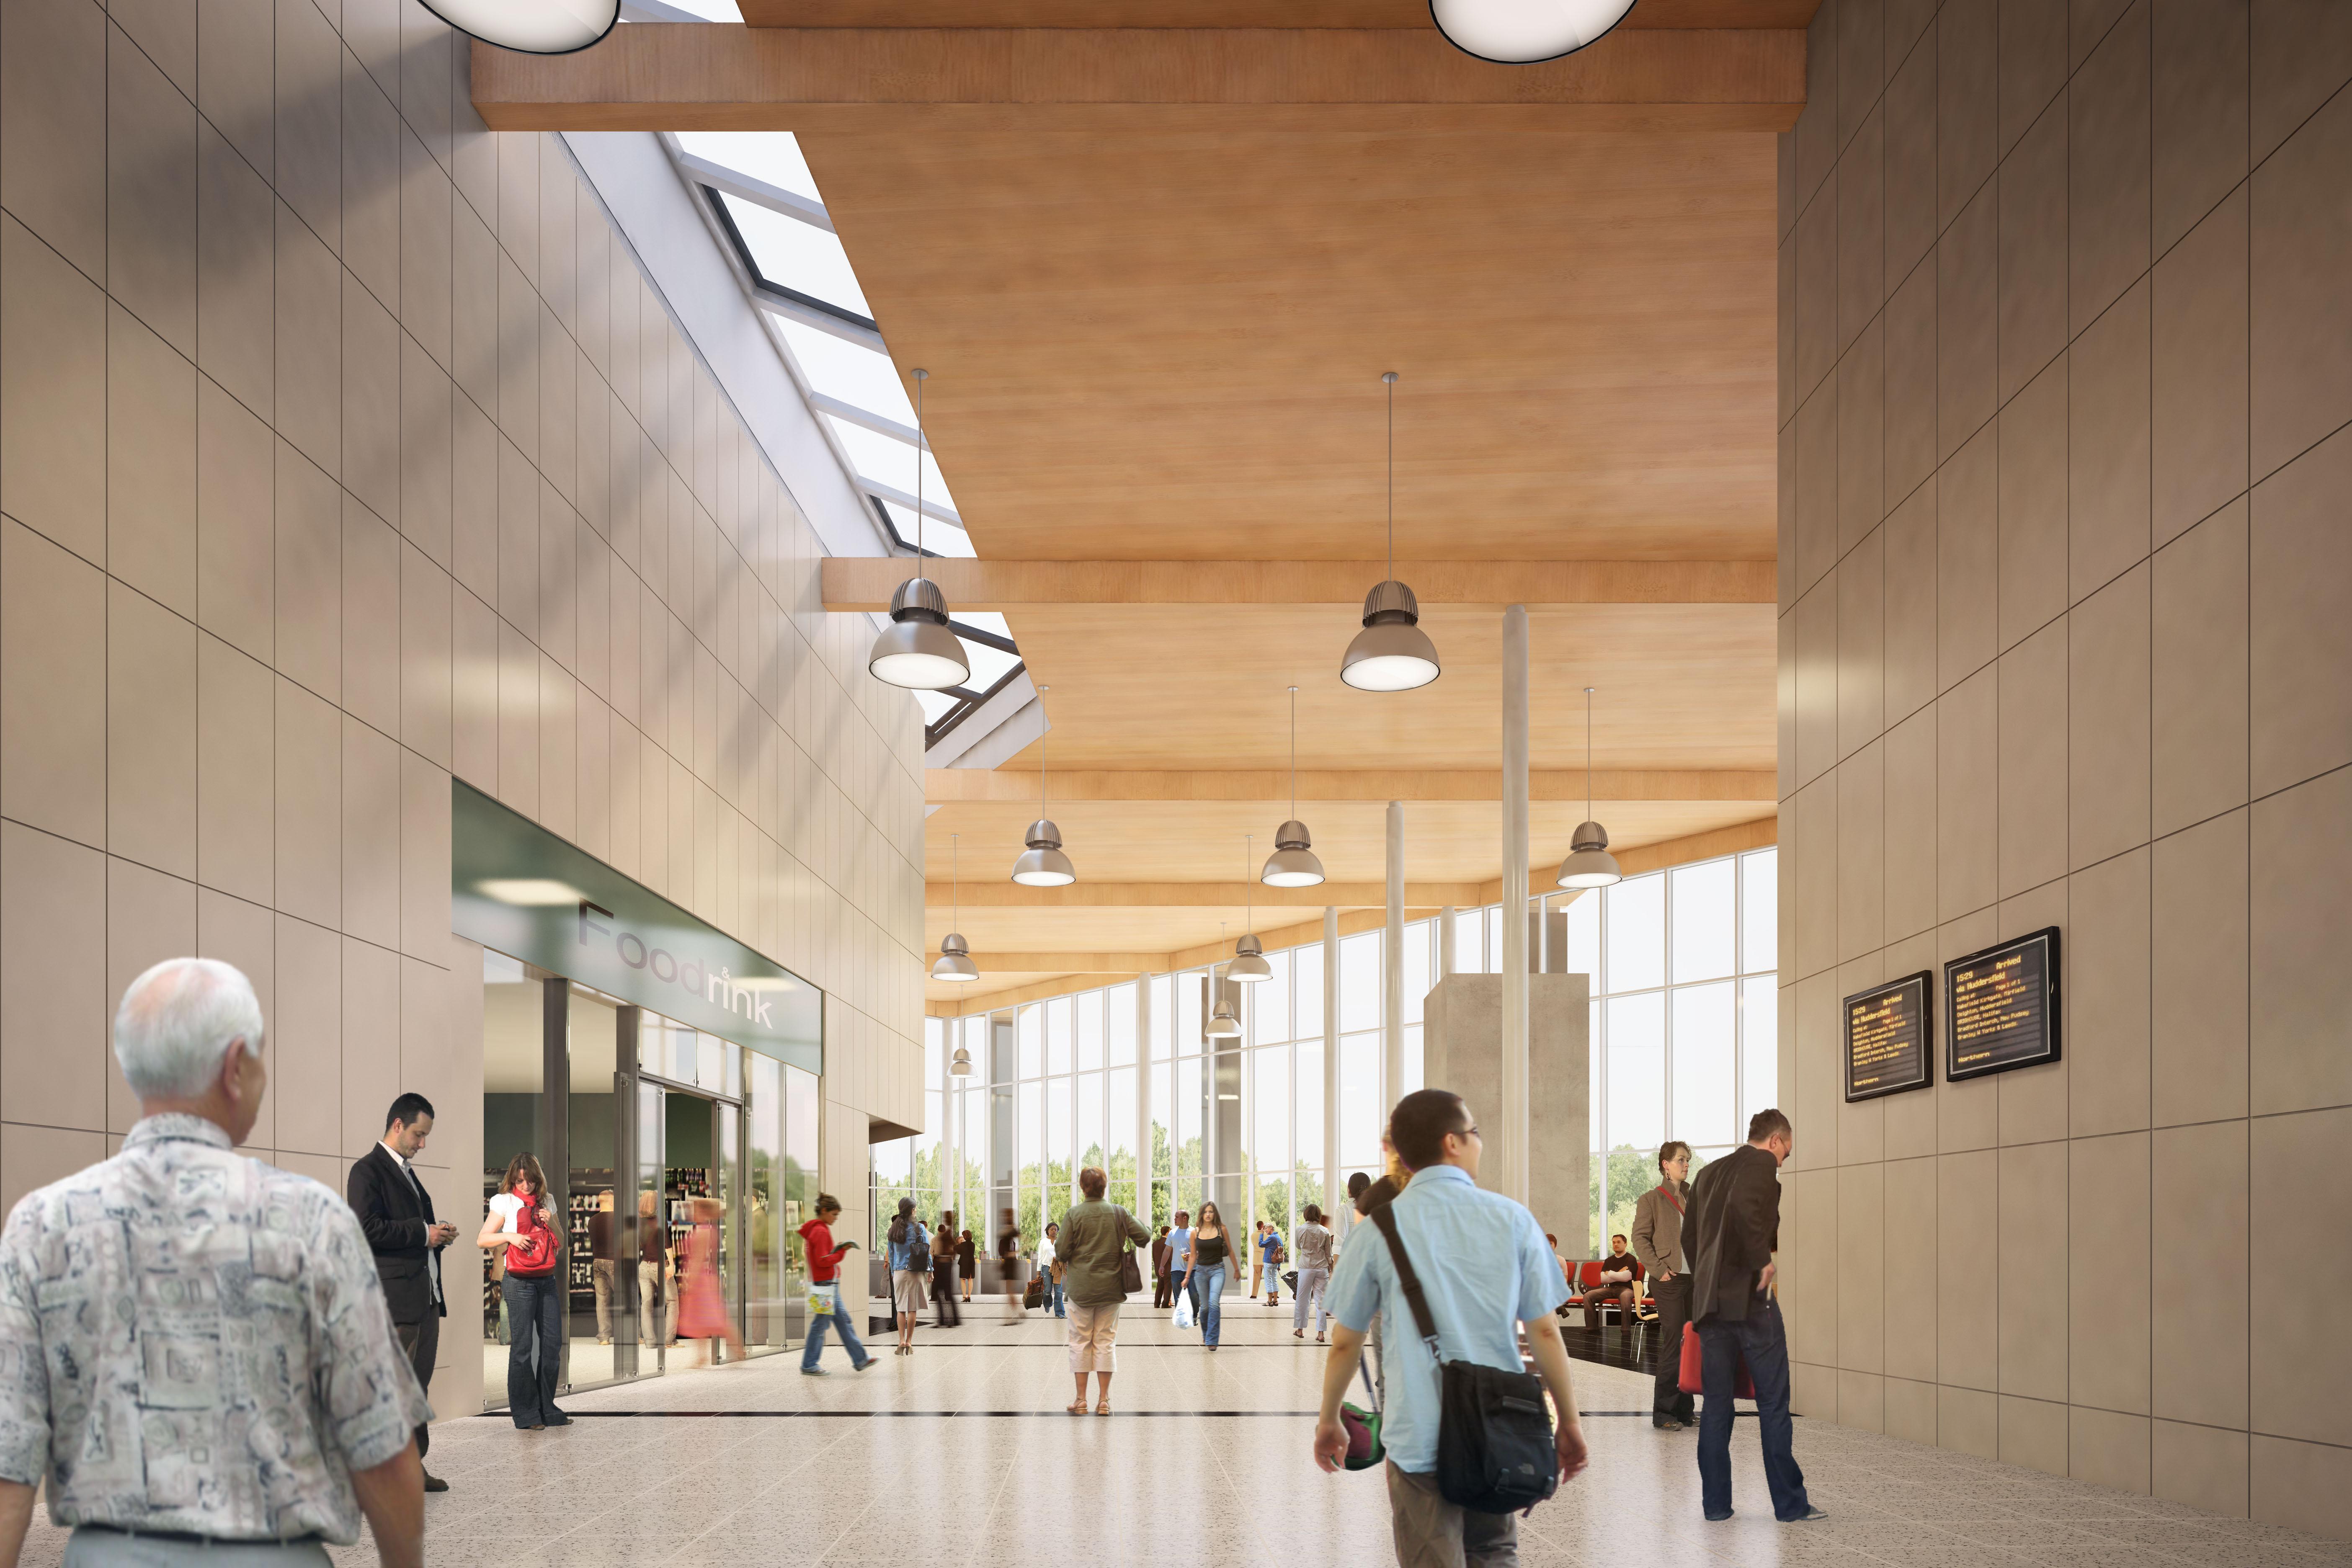 Northampton-Station_Interior_5616